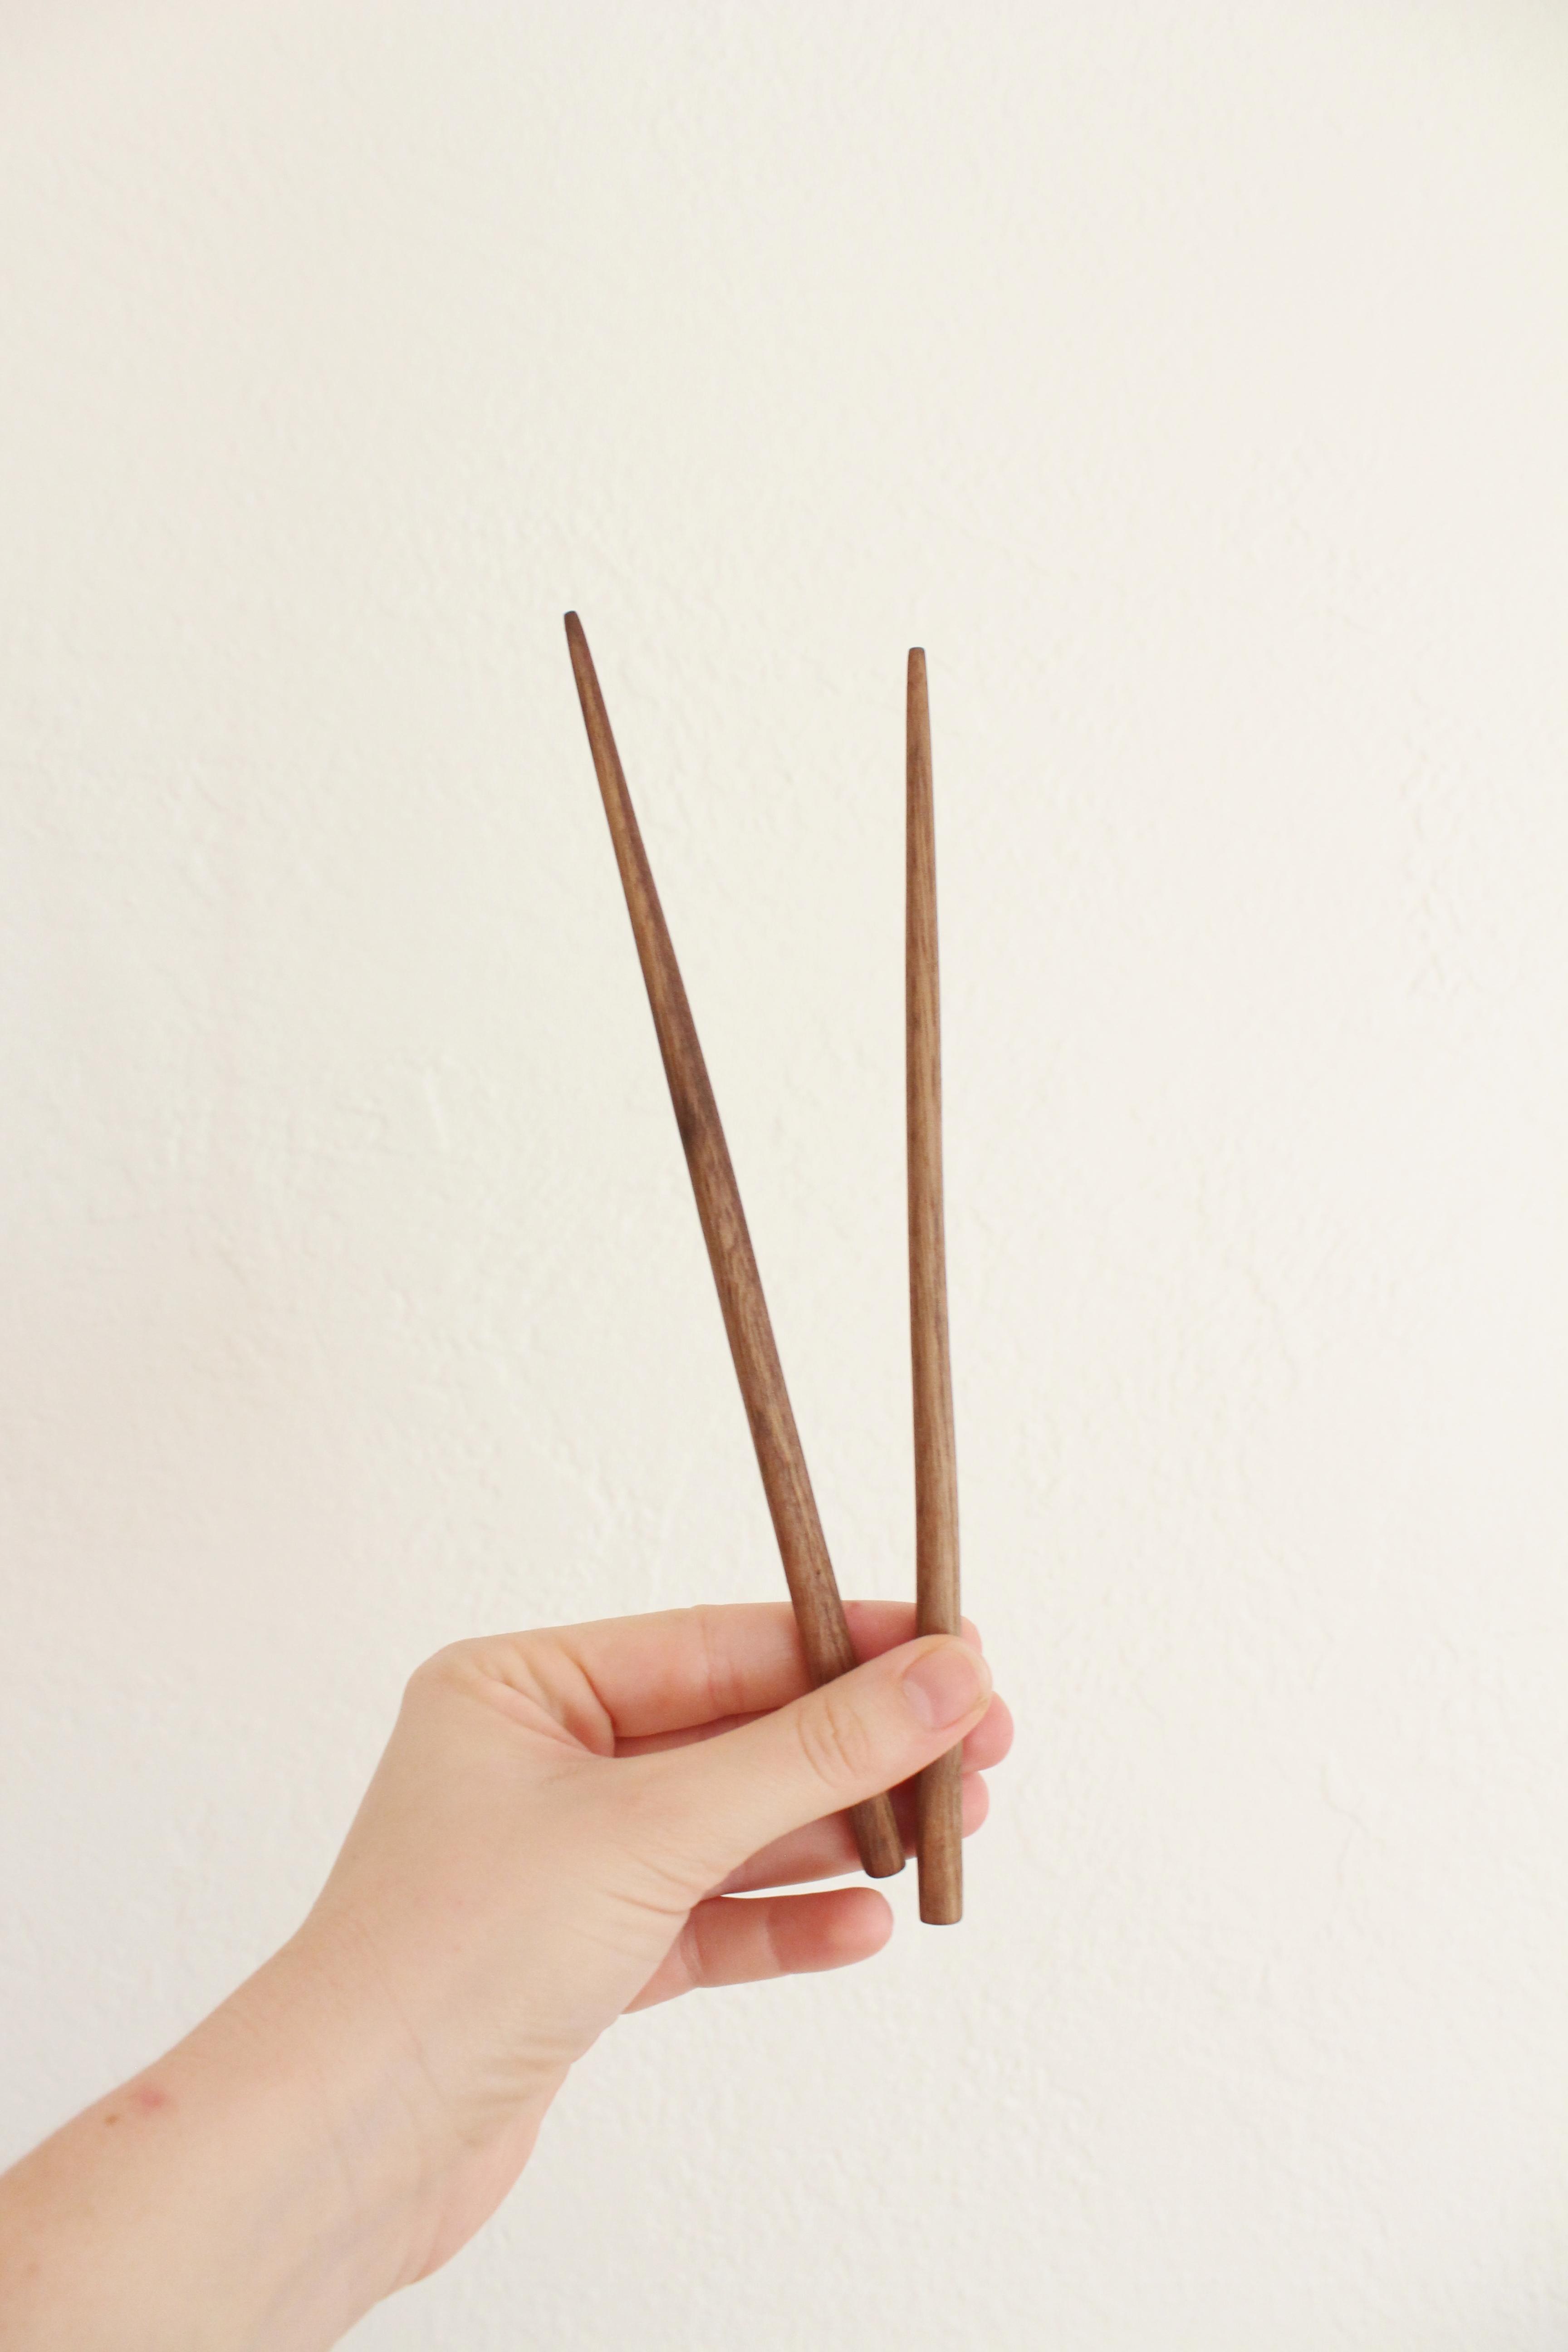 Walnut wood carved chopsticks